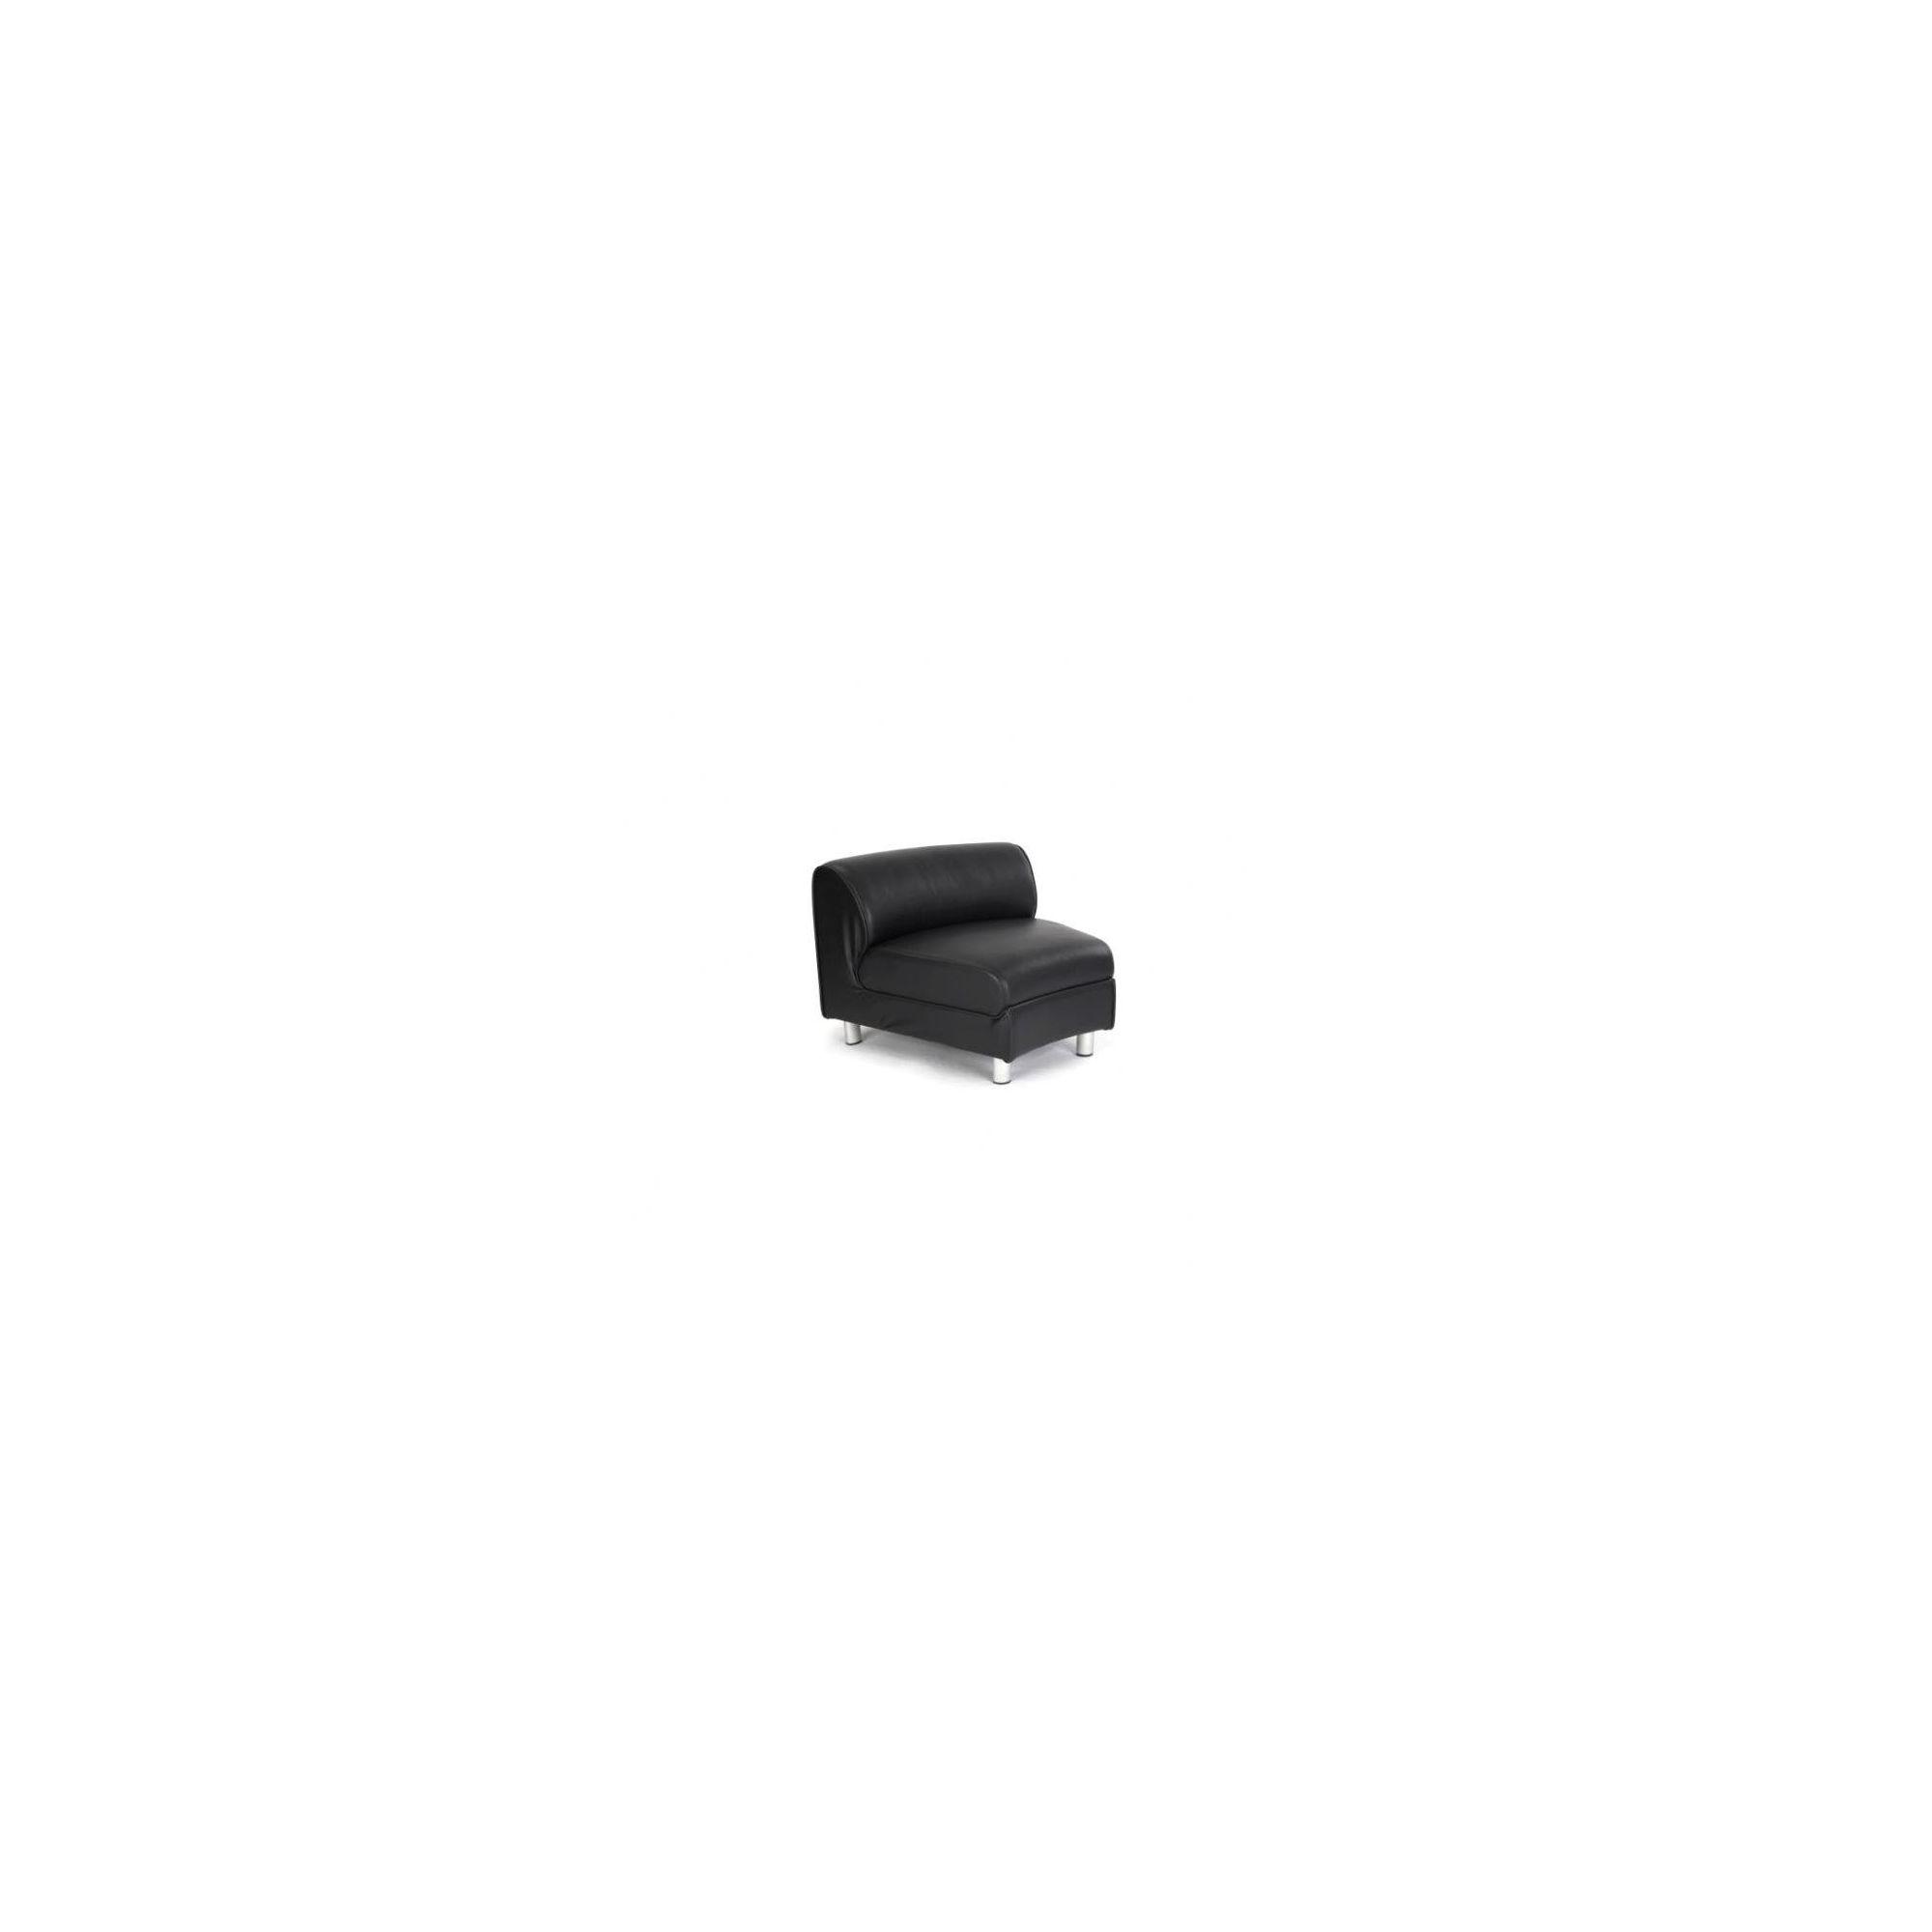 Enduro 65 cm x 85 cm Black Leather Convex Modular Sectional at Tesco Direct